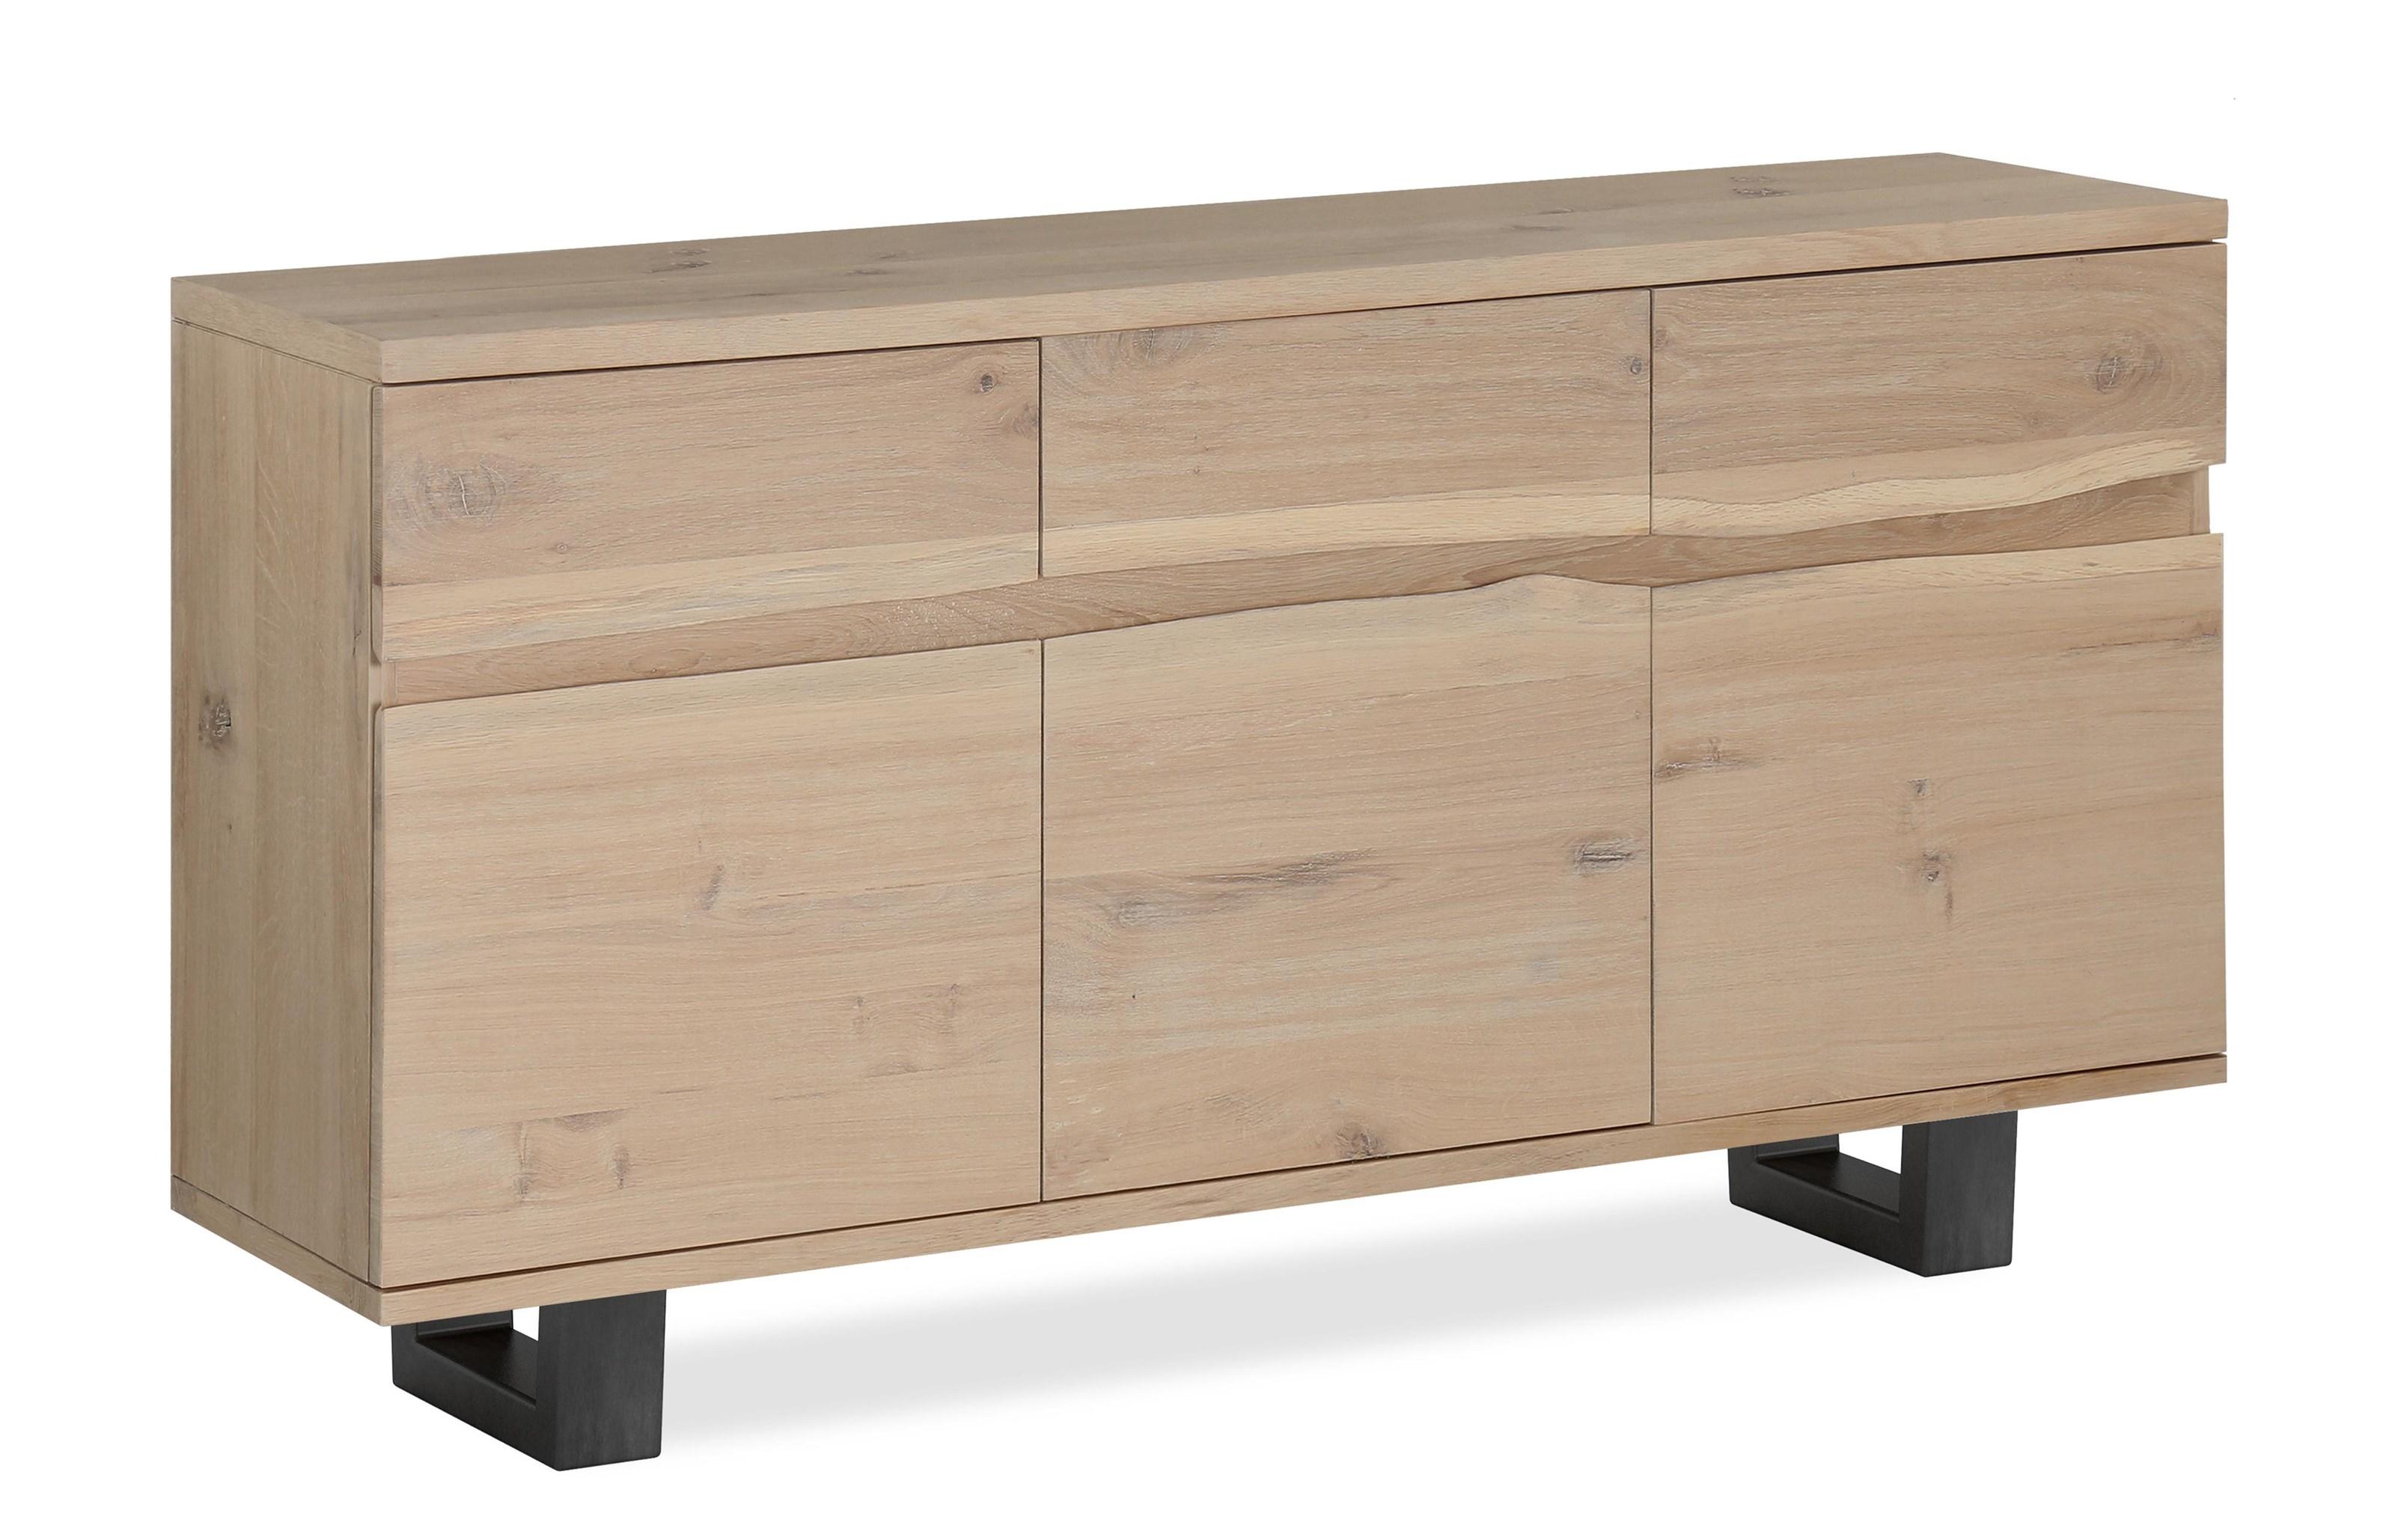 Oak Mill Sideboard by Global Home at HomeWorld Furniture